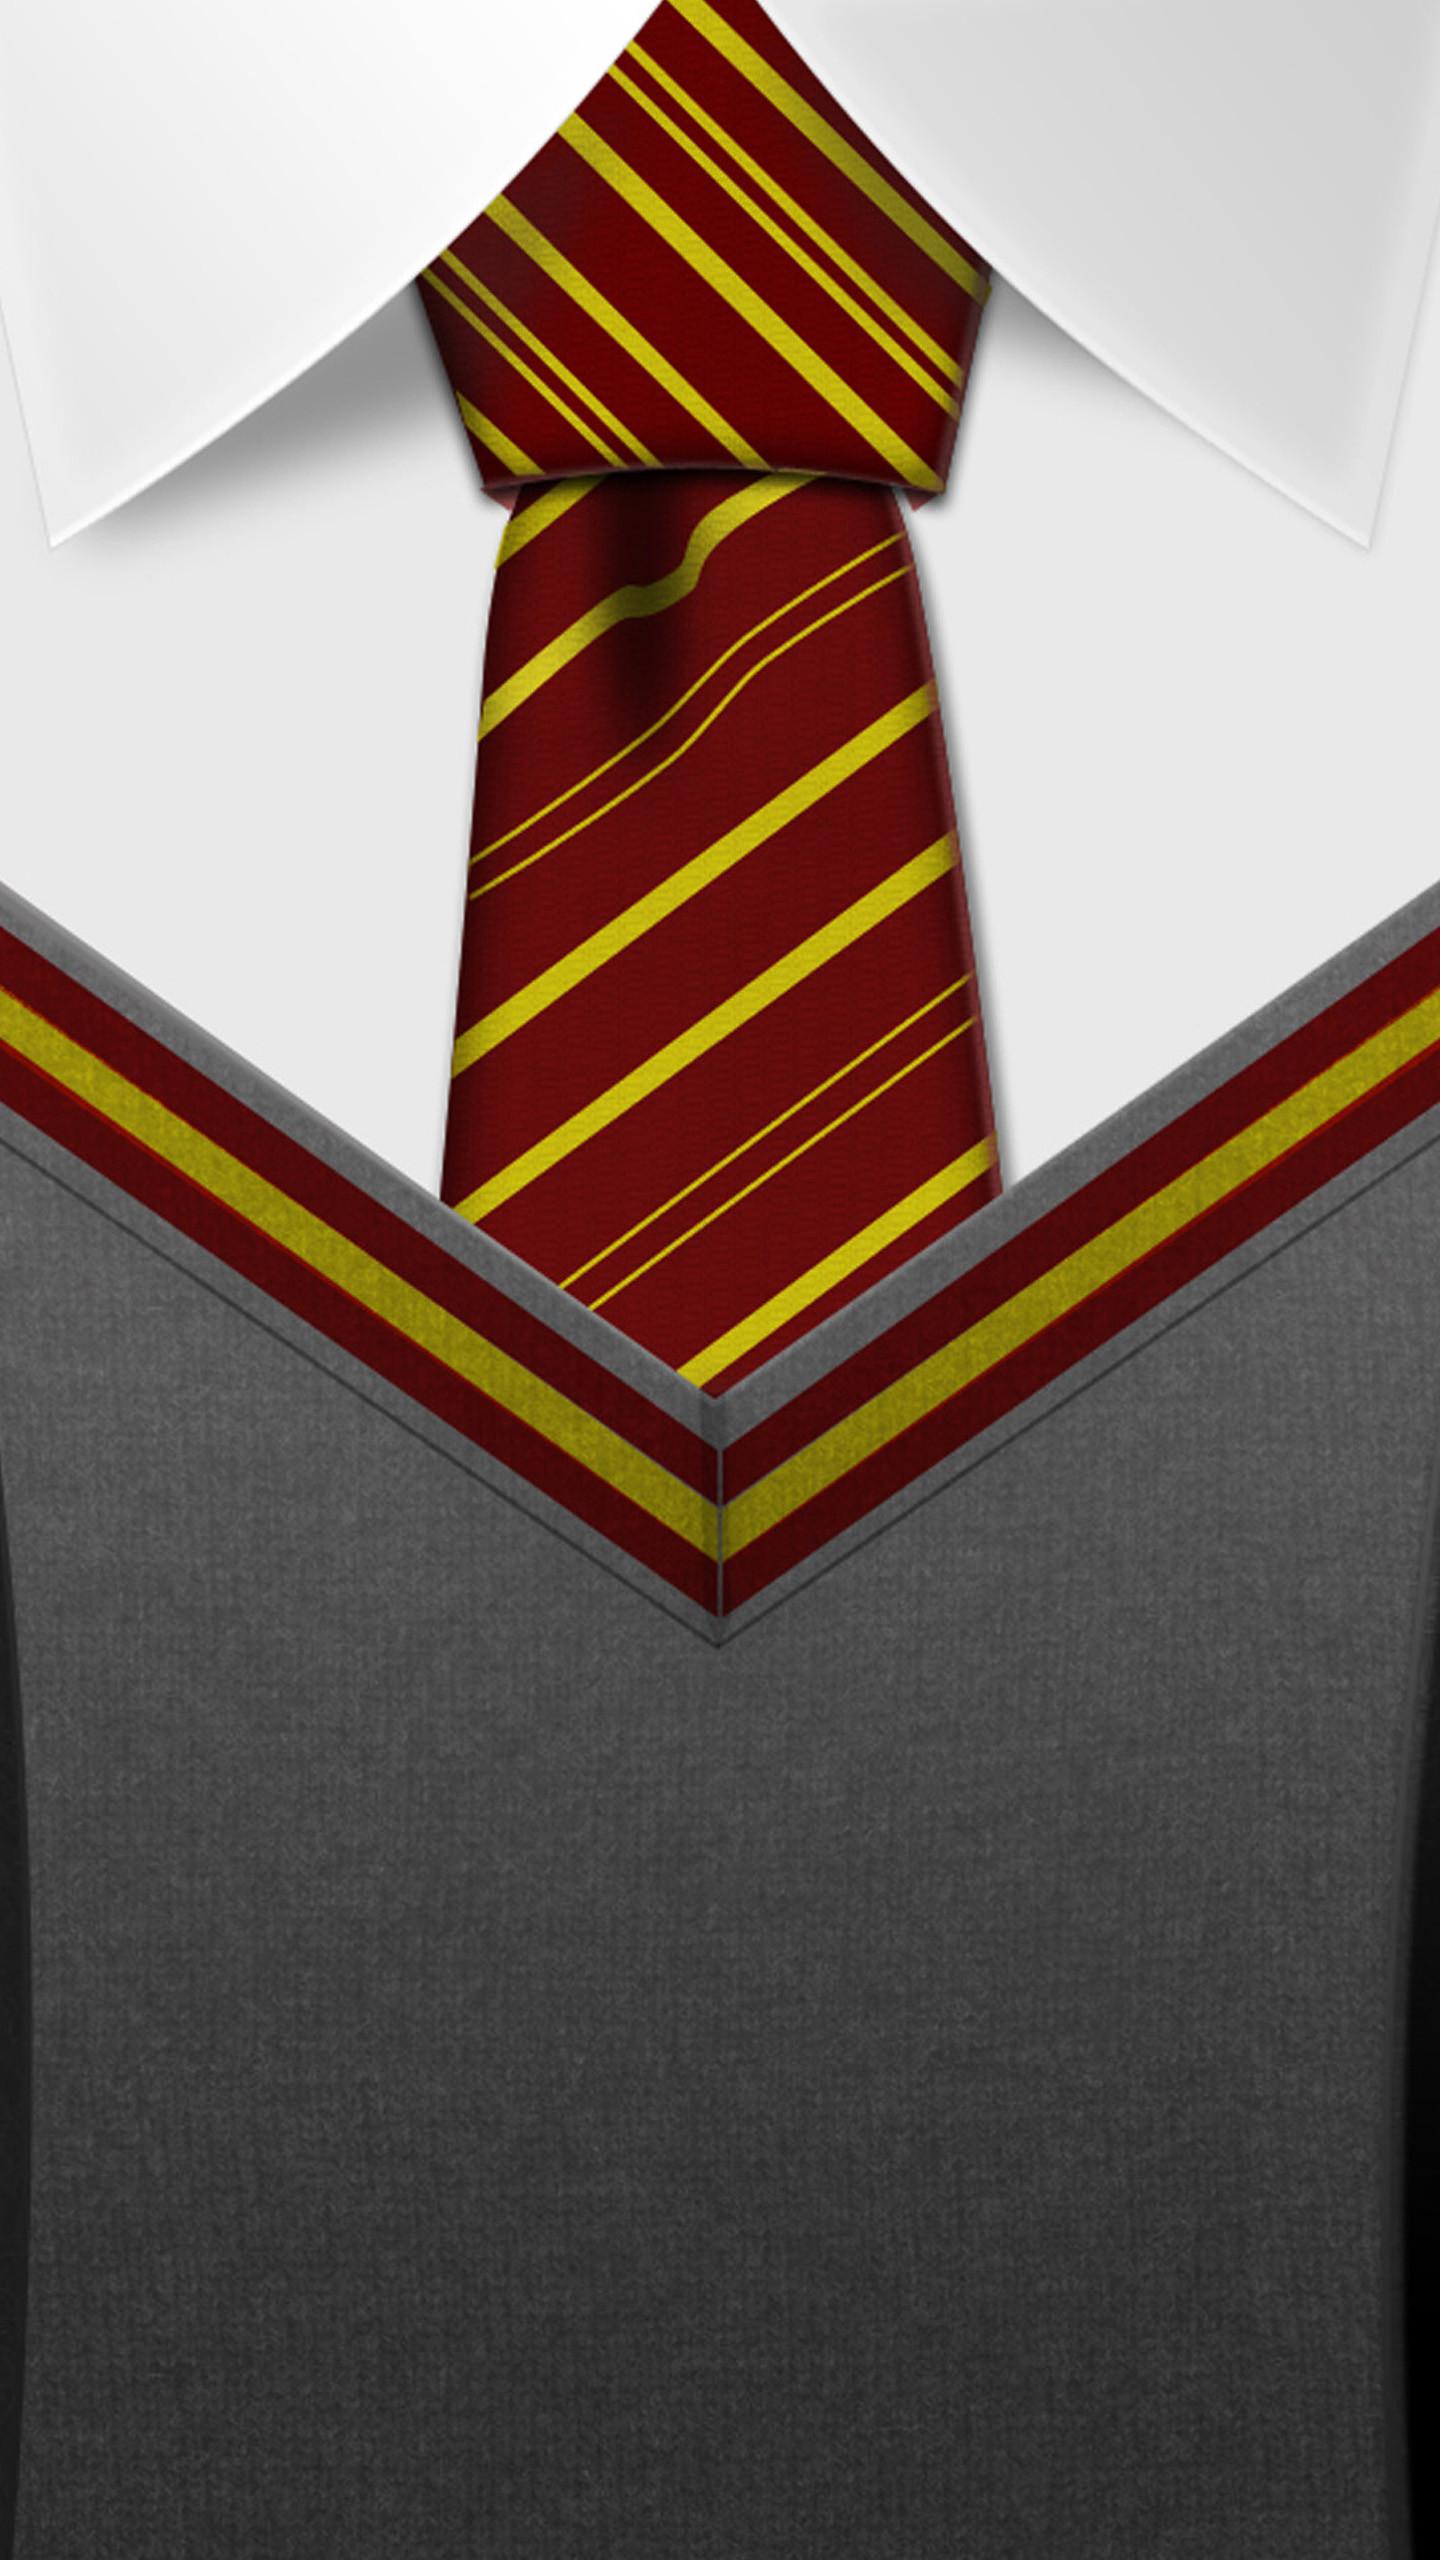 Harry Potter gryffindor tie LG G3 Wallpapers